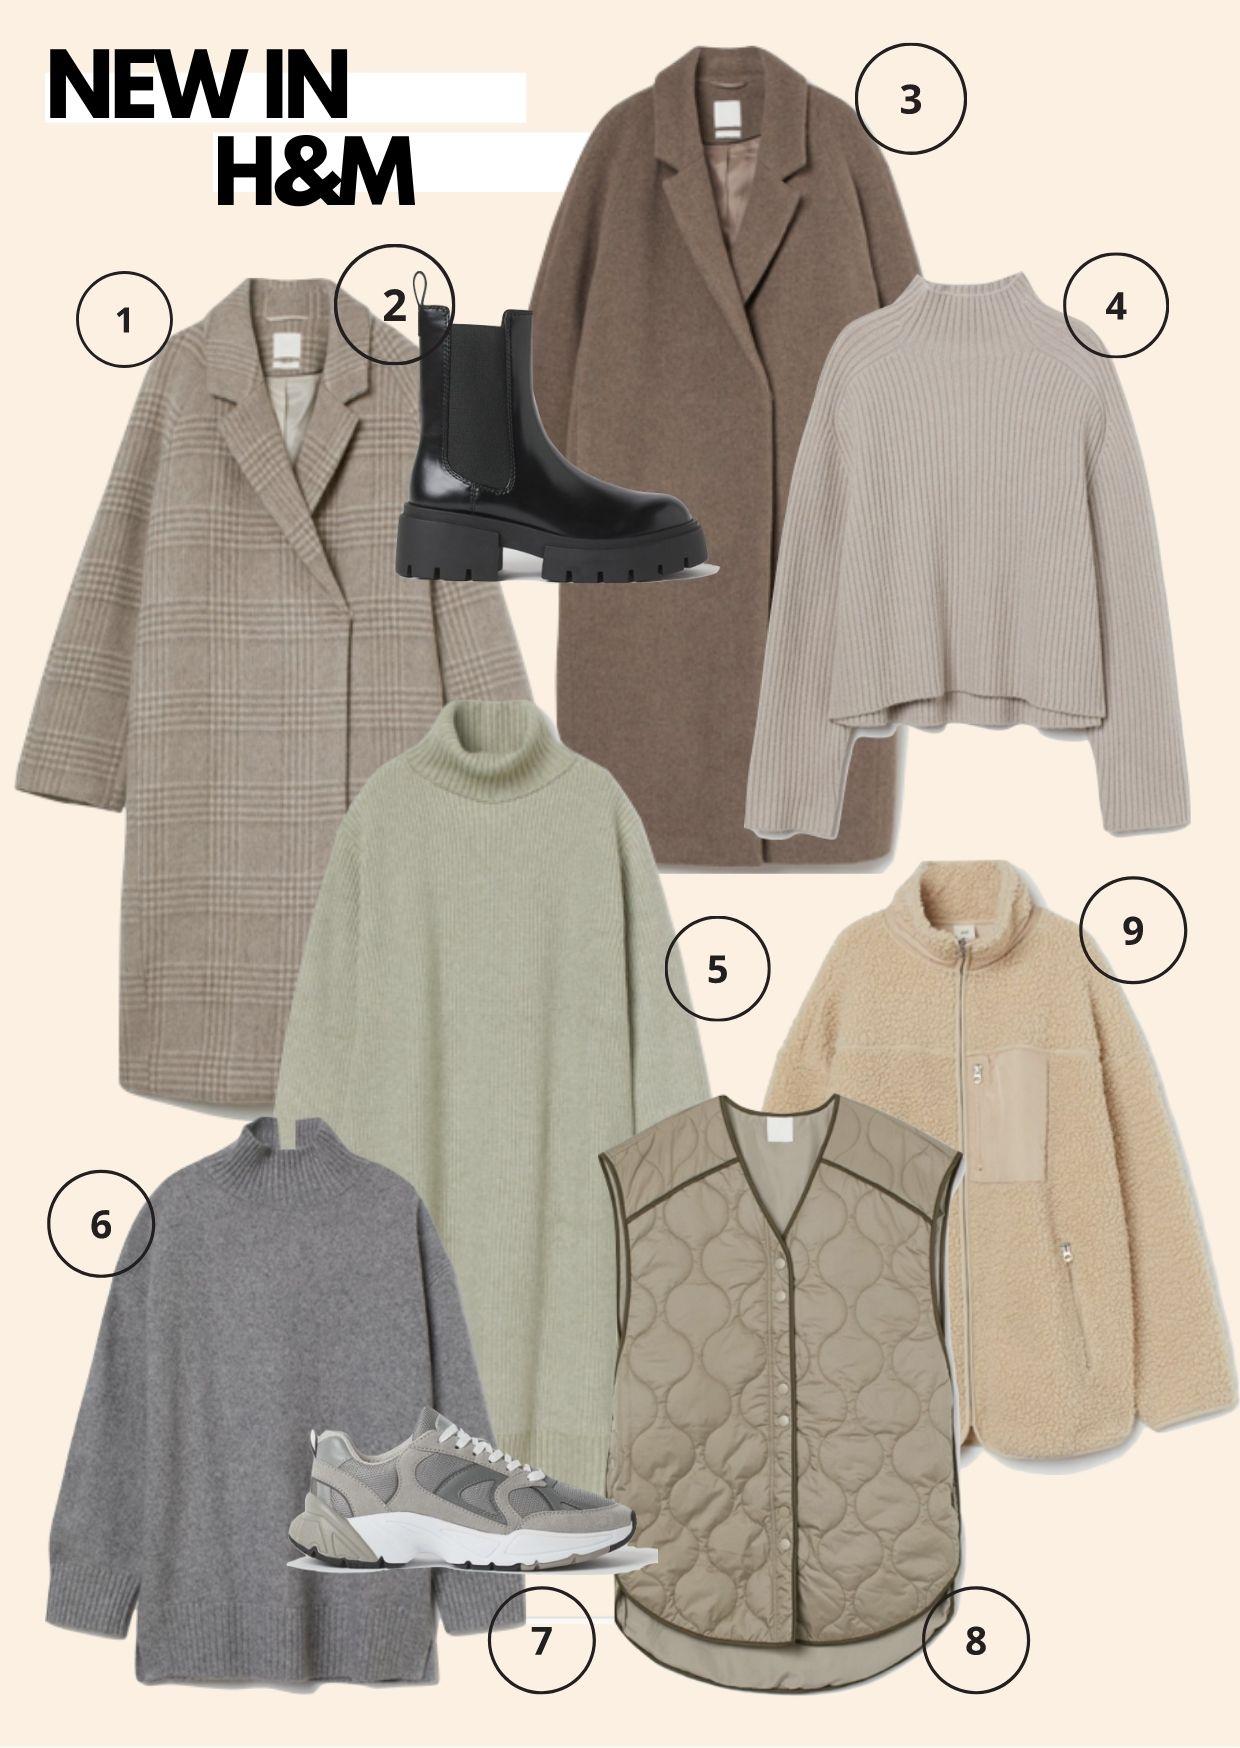 new in H&M autumn winter